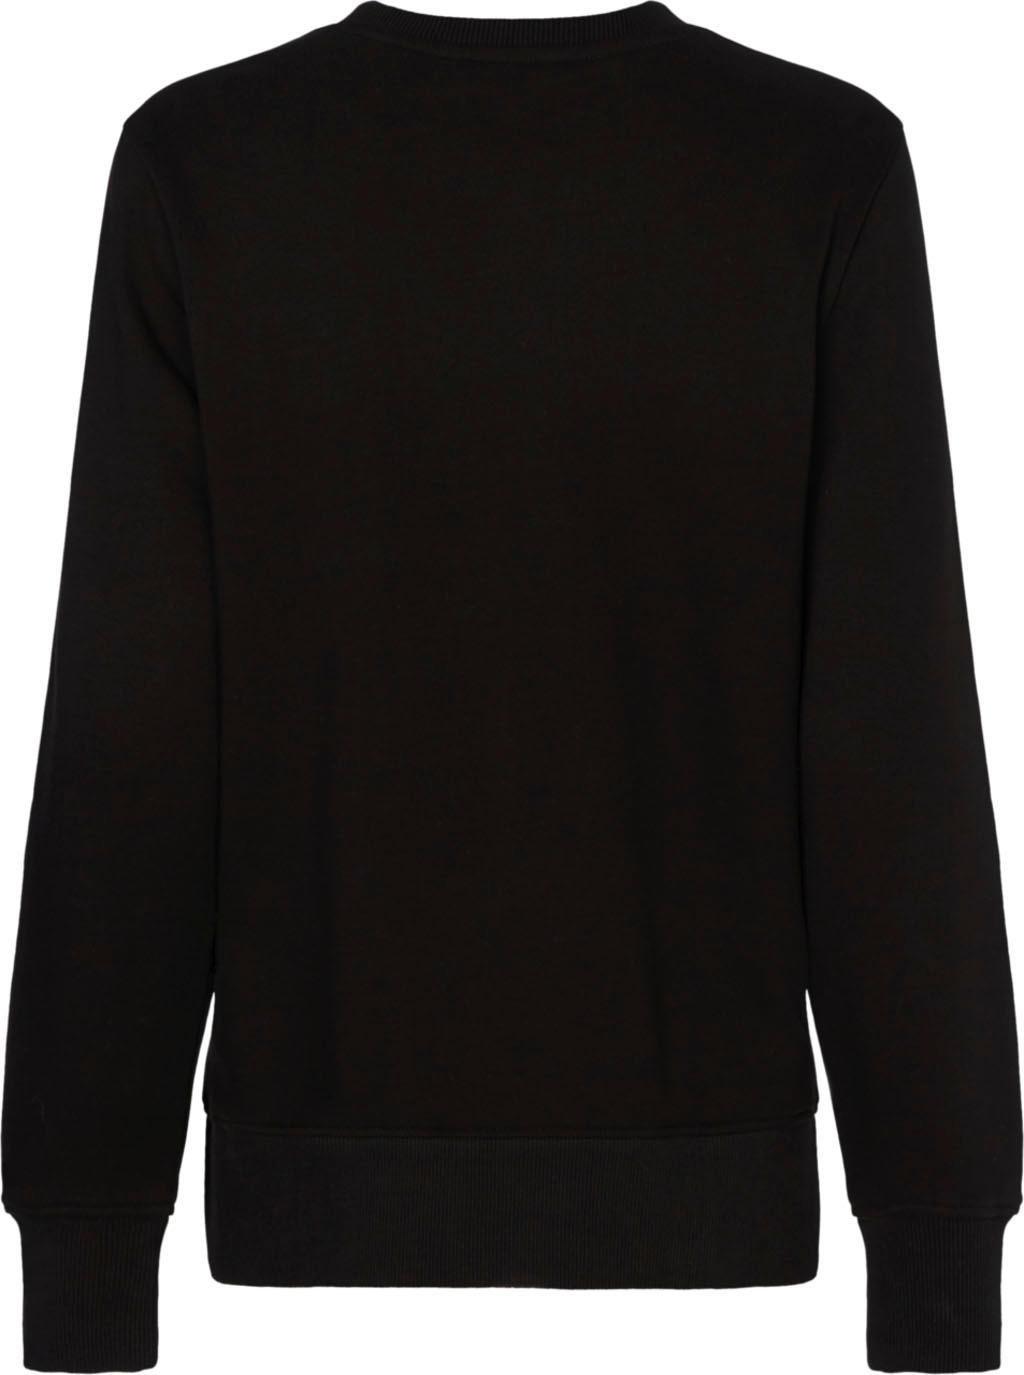 Tommy Hilfiger sweatshirt »TH ESS HILFIGER C-NK SWEATSHIRT« bestellen: 30 dagen bedenktijd